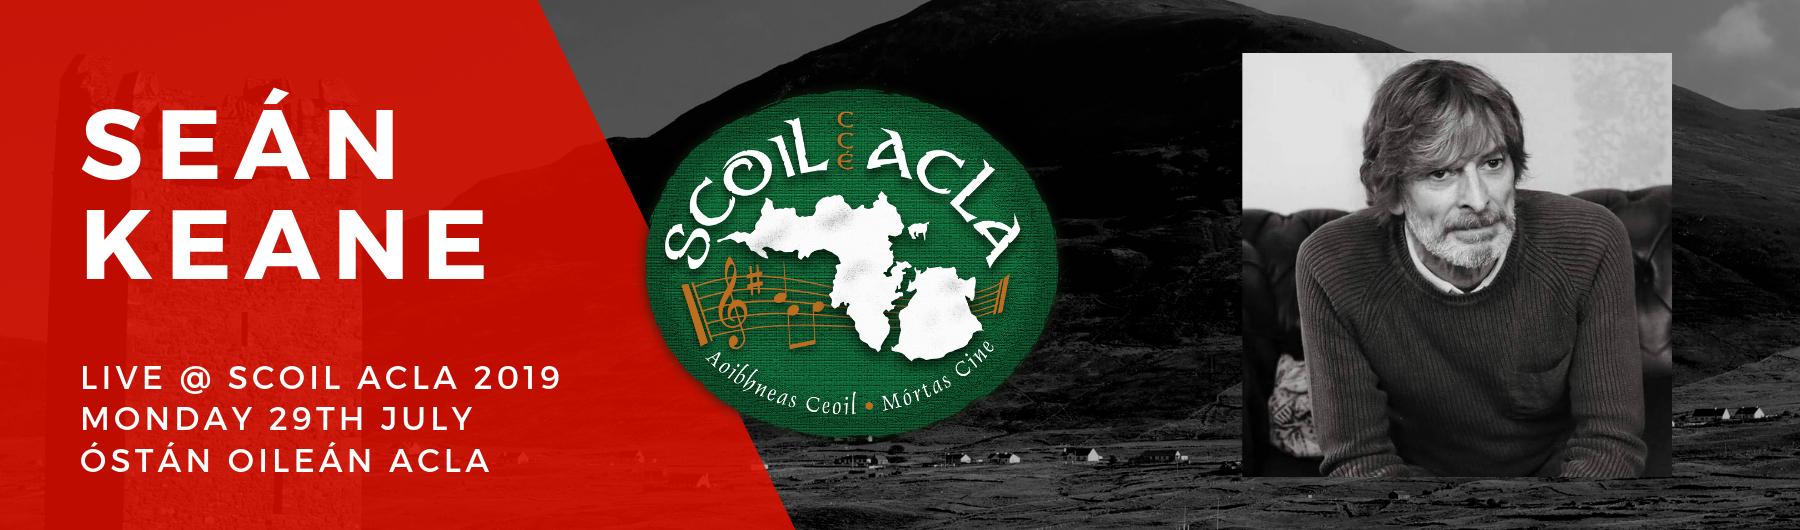 Seán Keane Live @ Scoil Acla